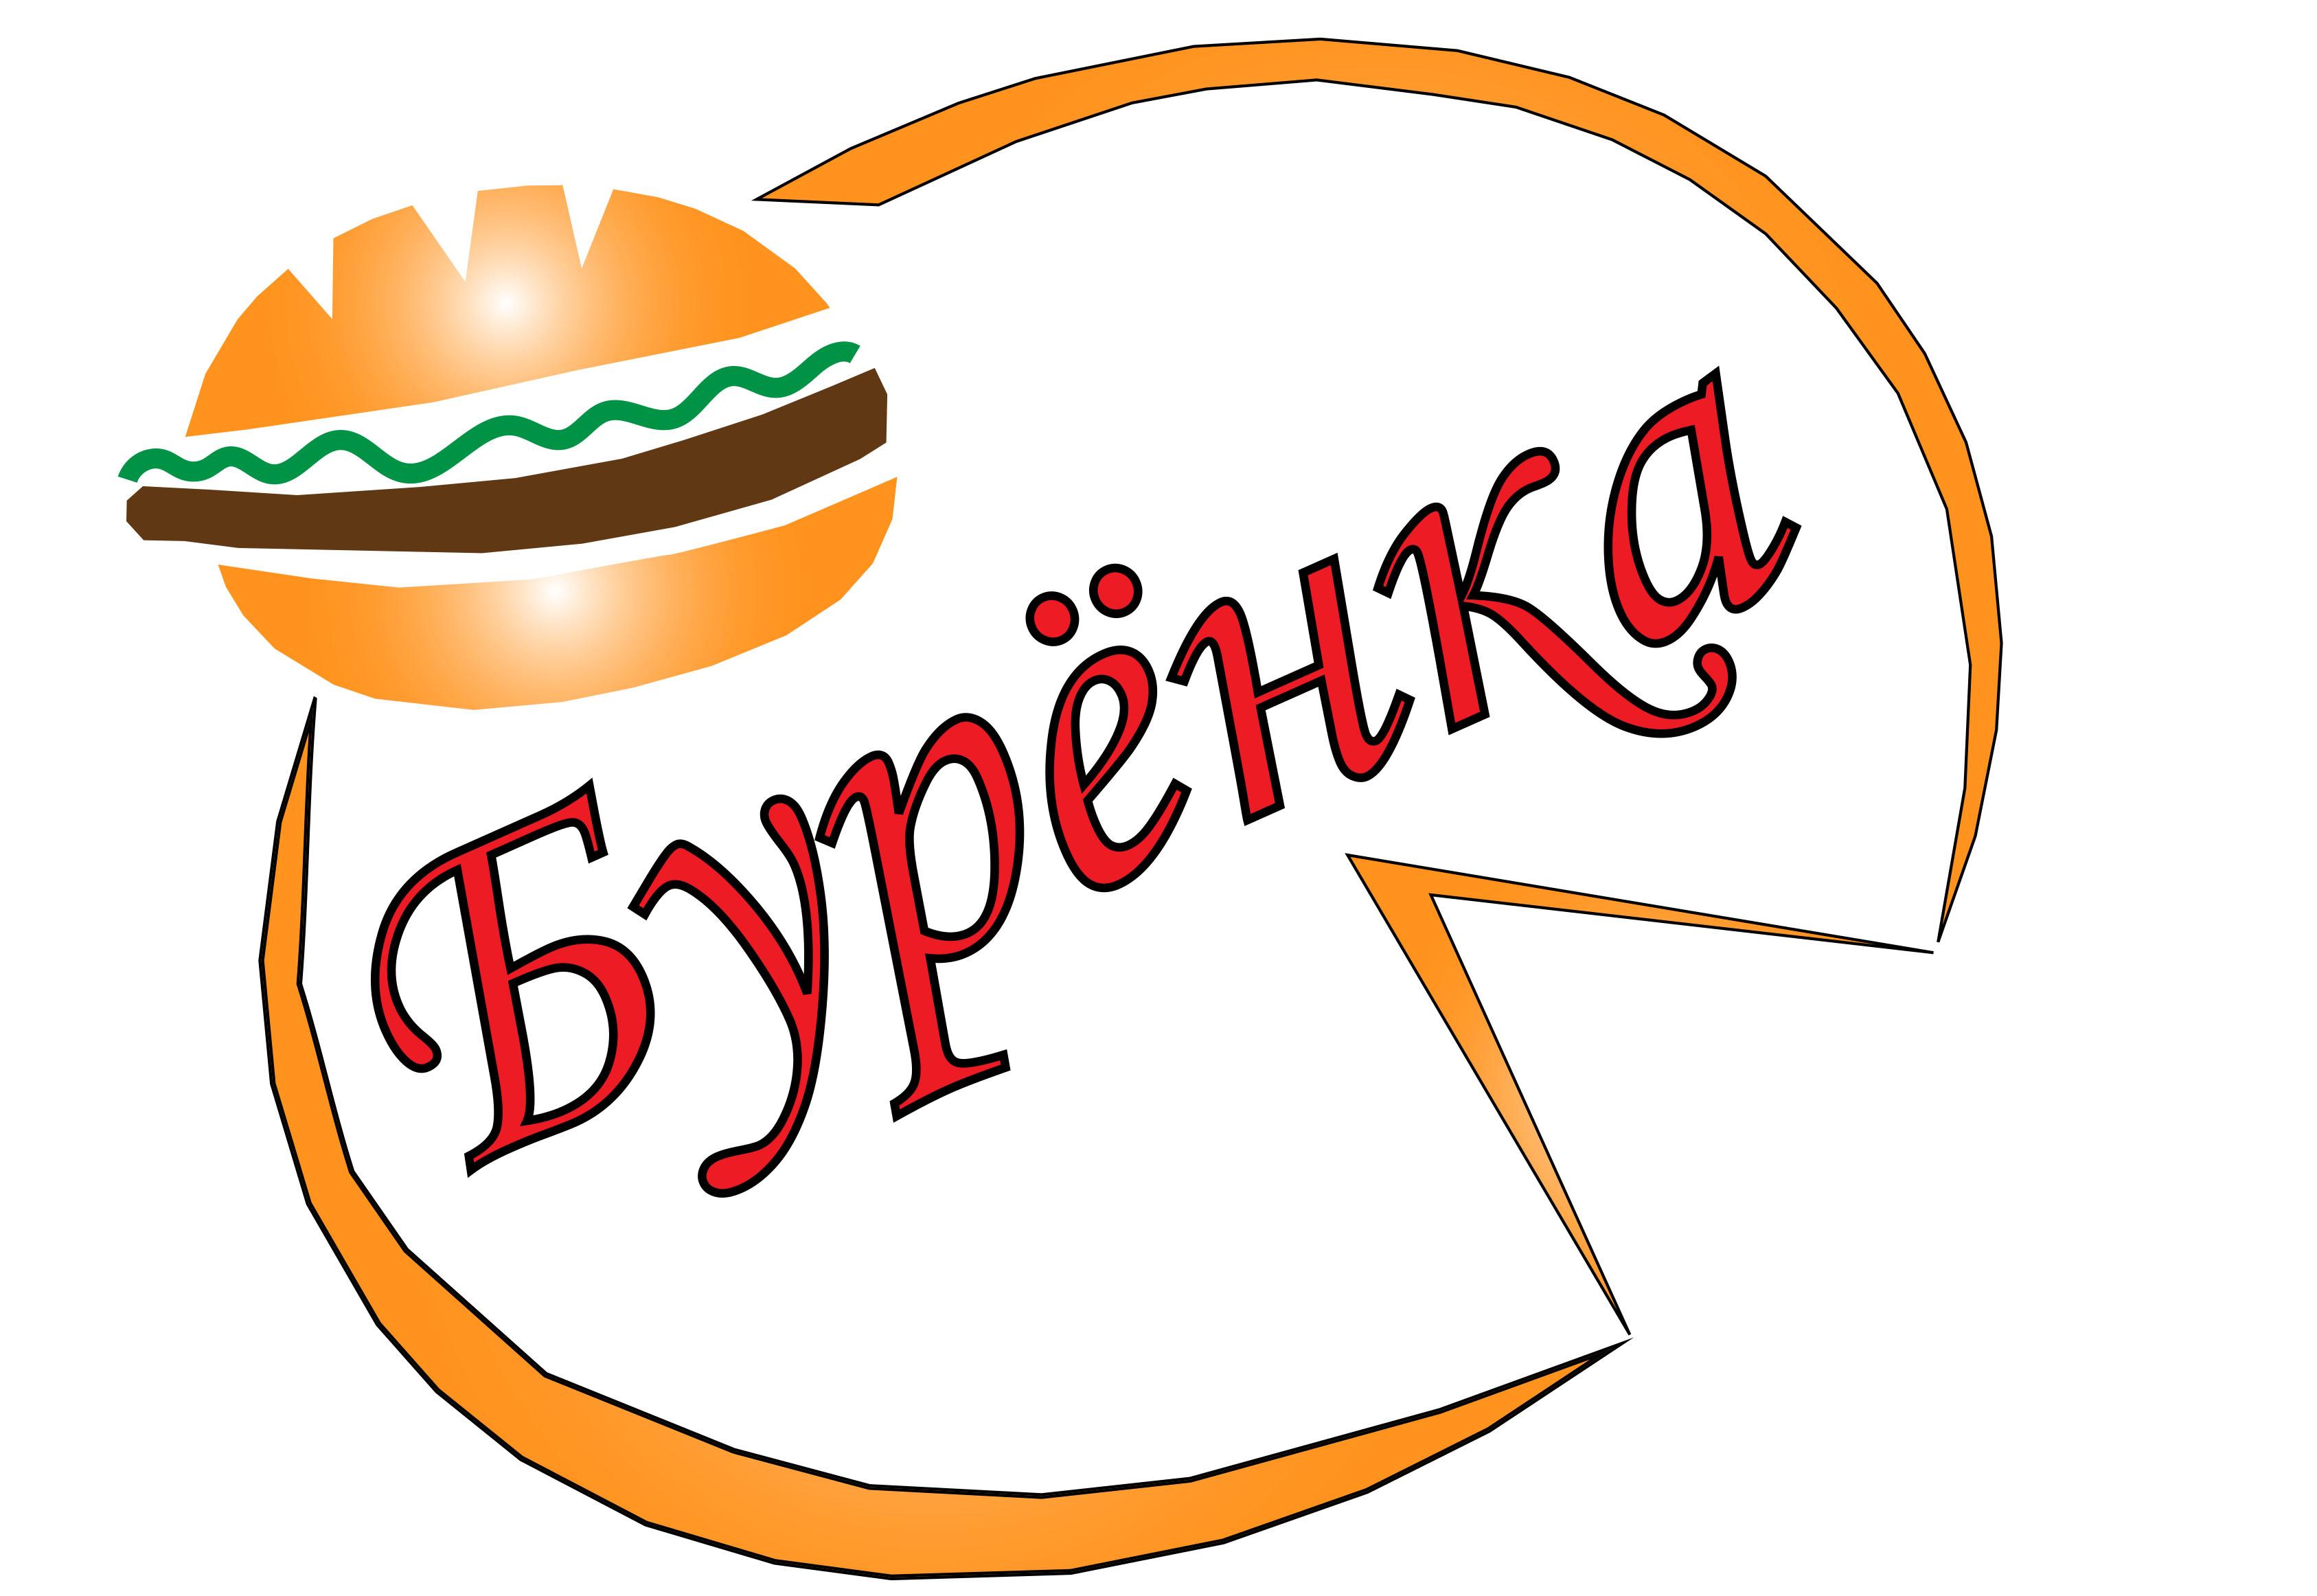 Логотип для Бургерной с Пекарней фото f_1375e106f8f31710.jpg